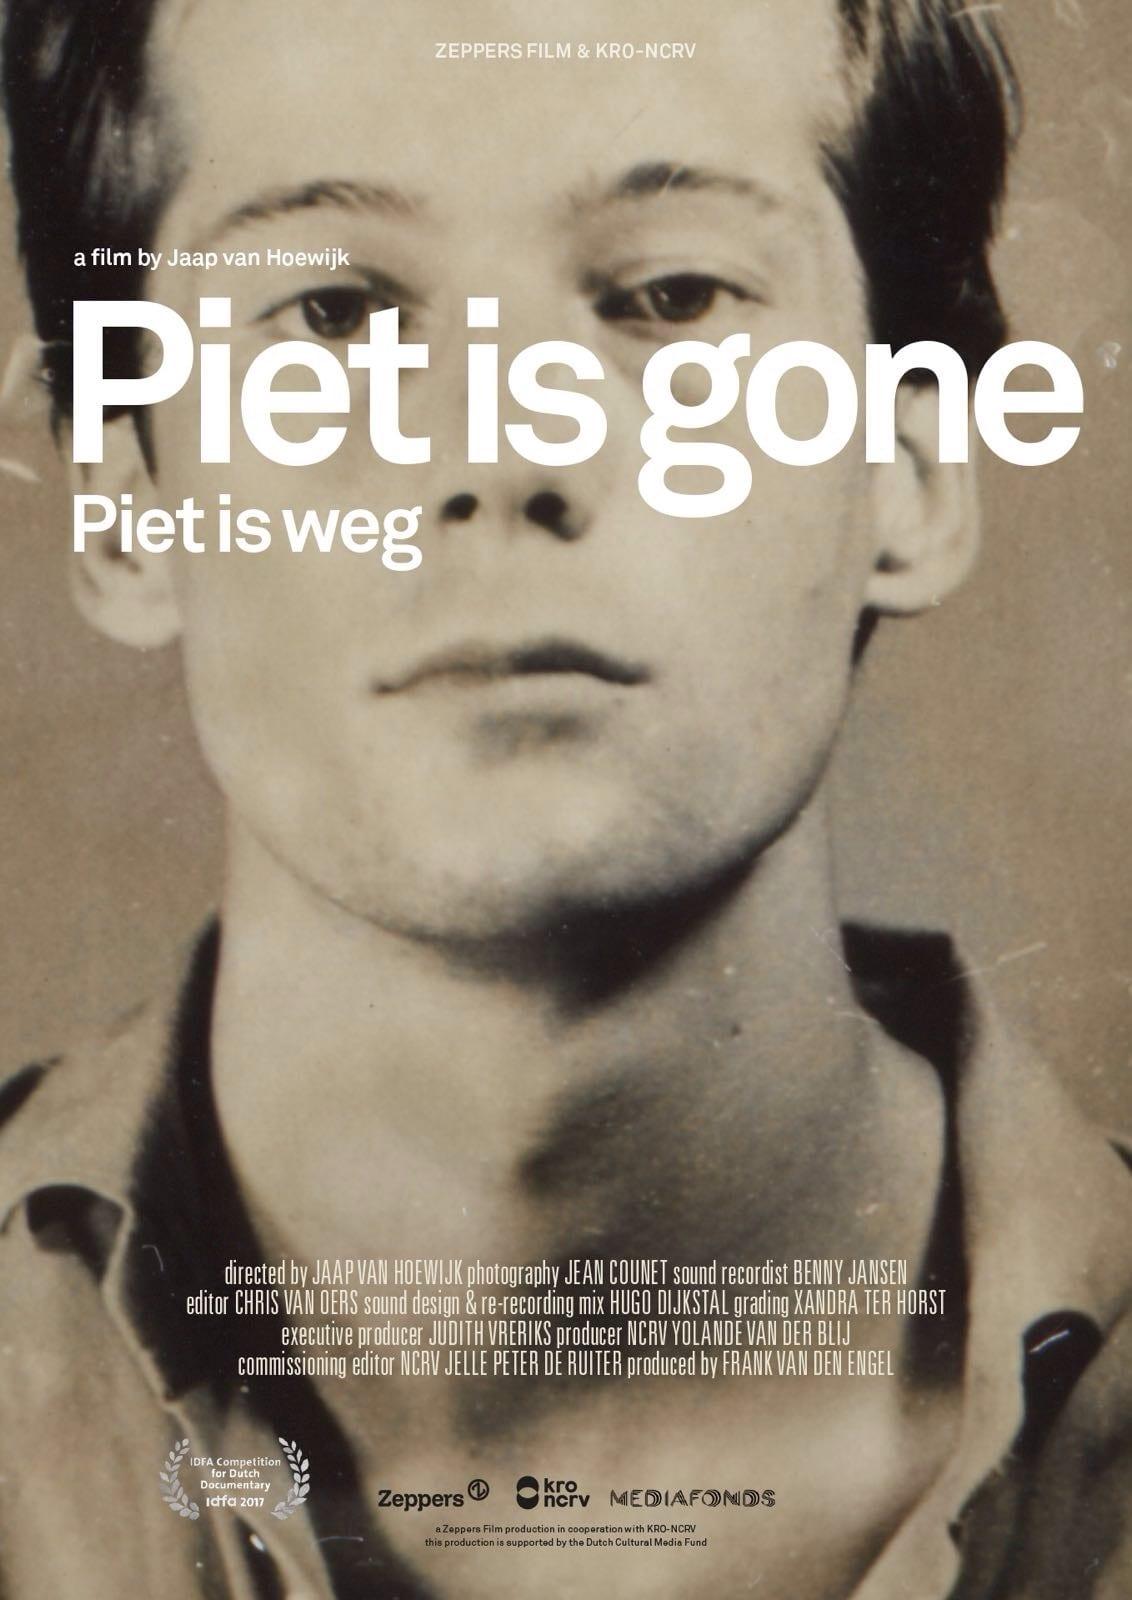 Piet is Gone